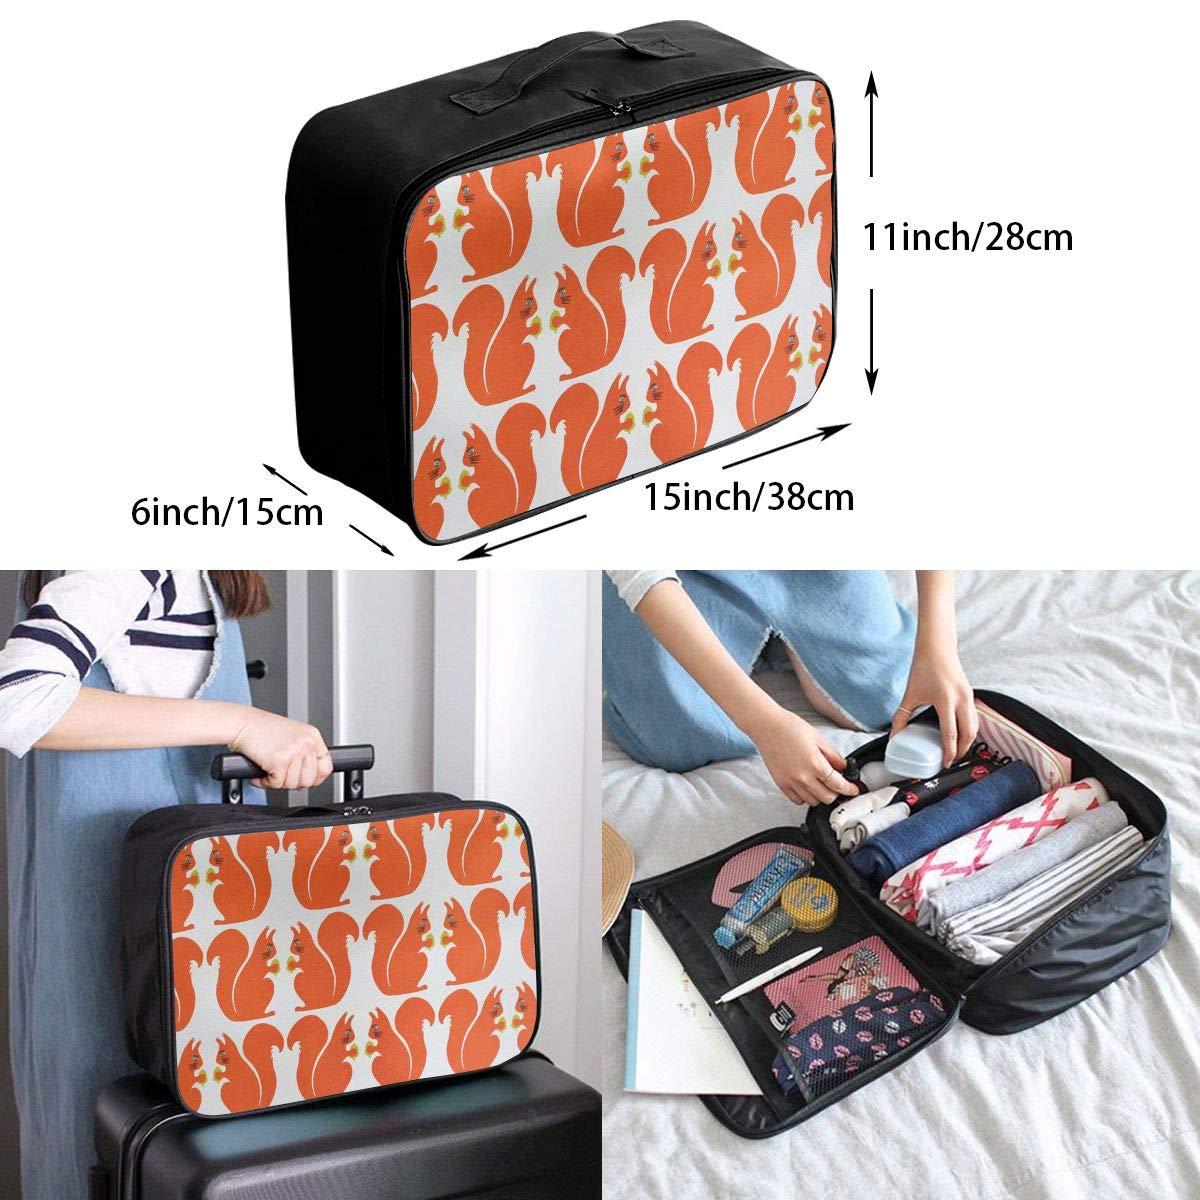 Travel Luggage Duffle Bag Lightweight Portable Handbag Squirrel Pattern Large Capacity Waterproof Foldable Storage Tote